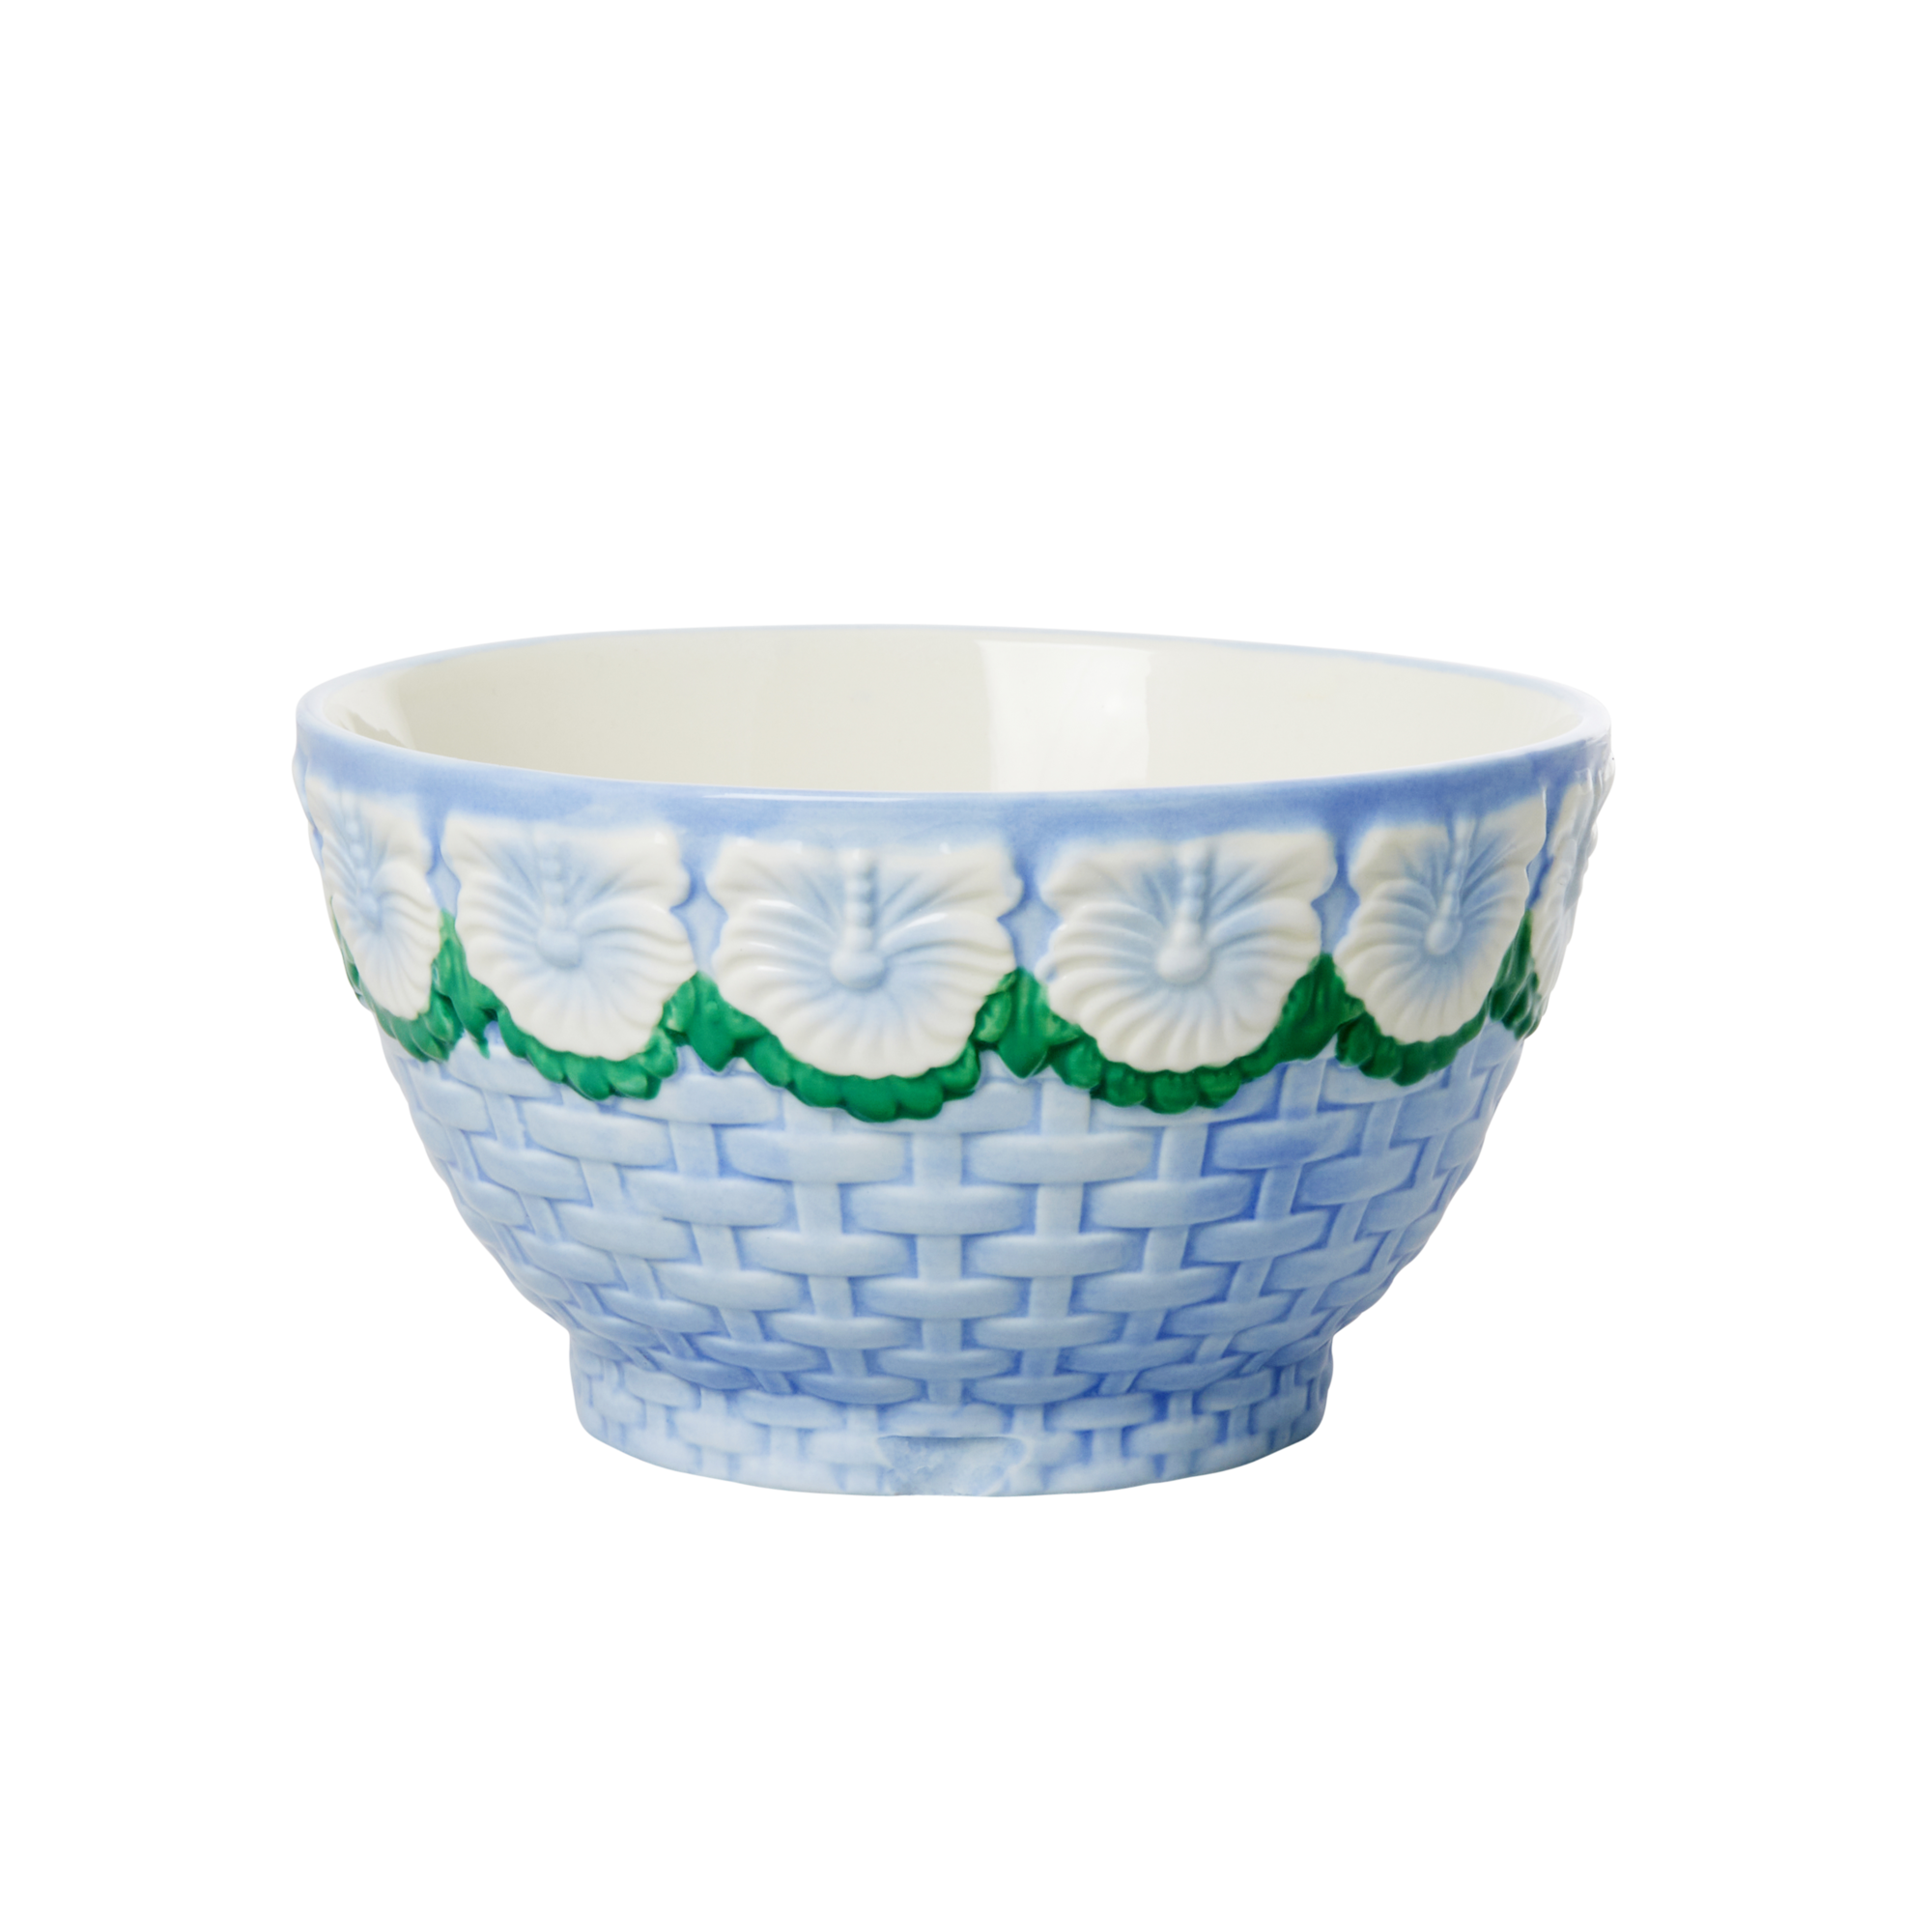 Rice - Ceramic Bowl with Embossed Flower Design - Blue